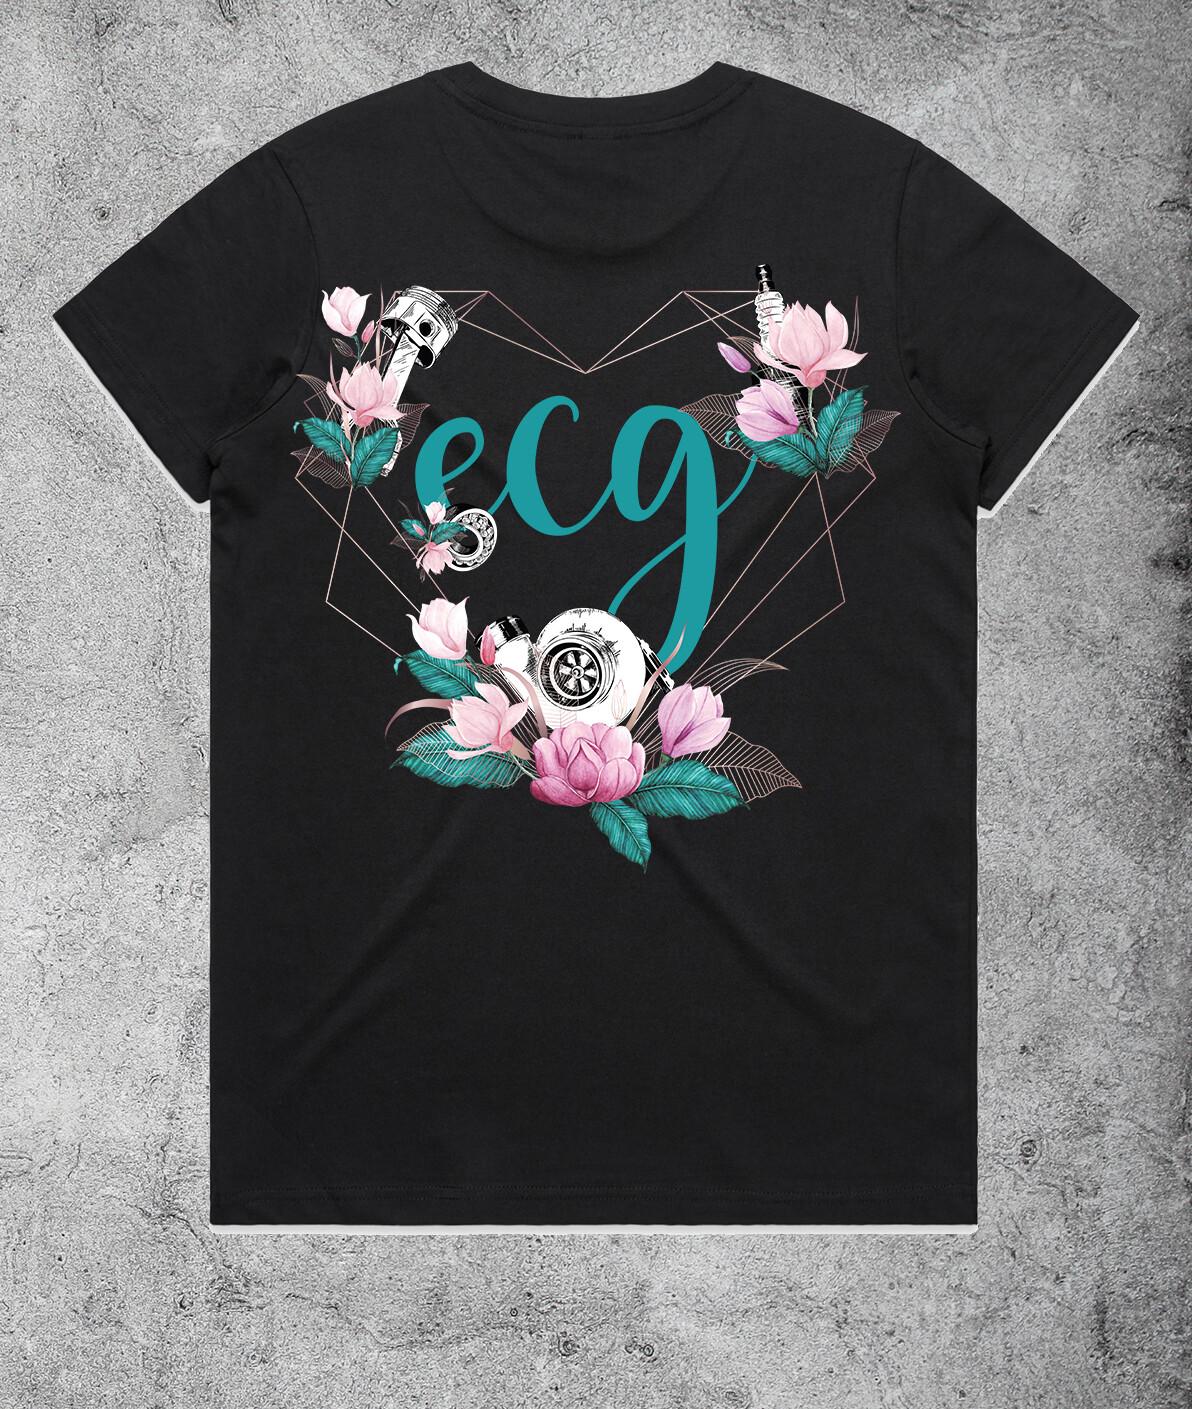 ECG Heart Logo T-shirt - Black